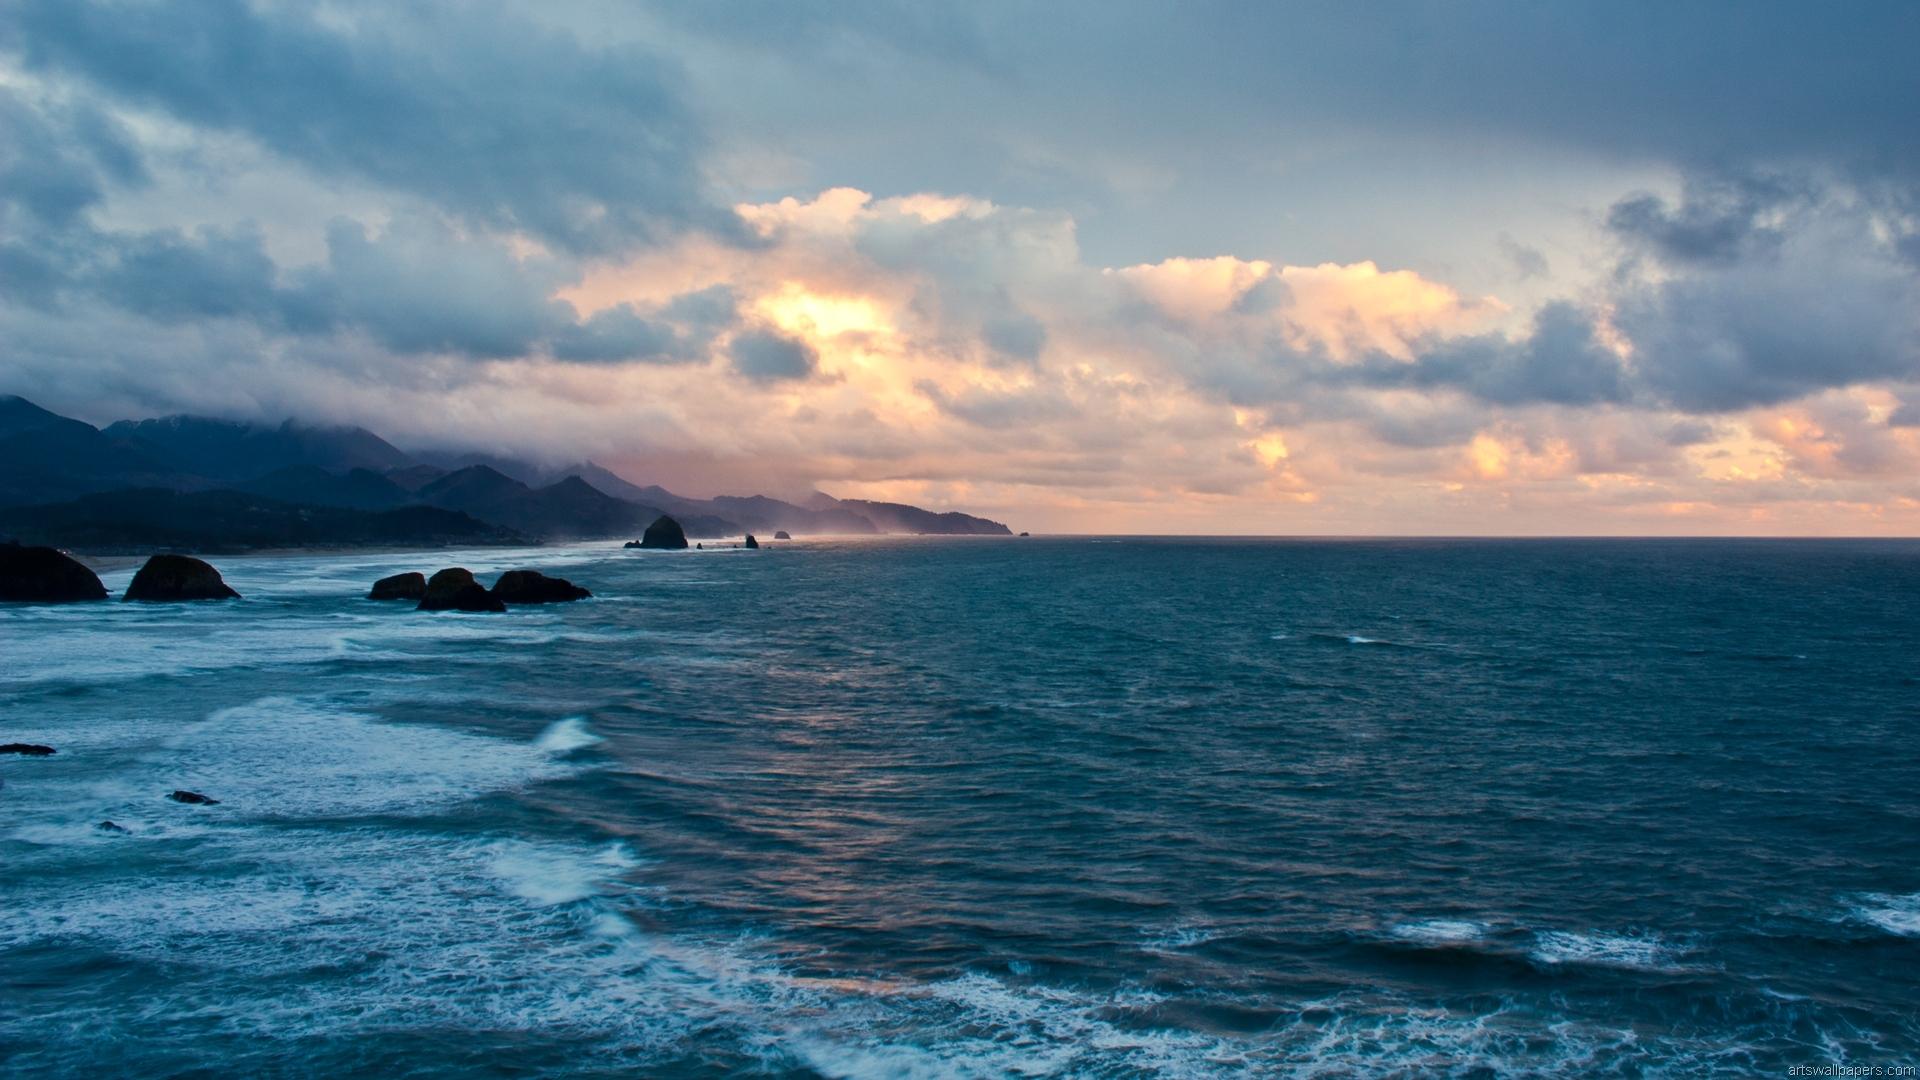 Ocean Background PNG HD - 129021